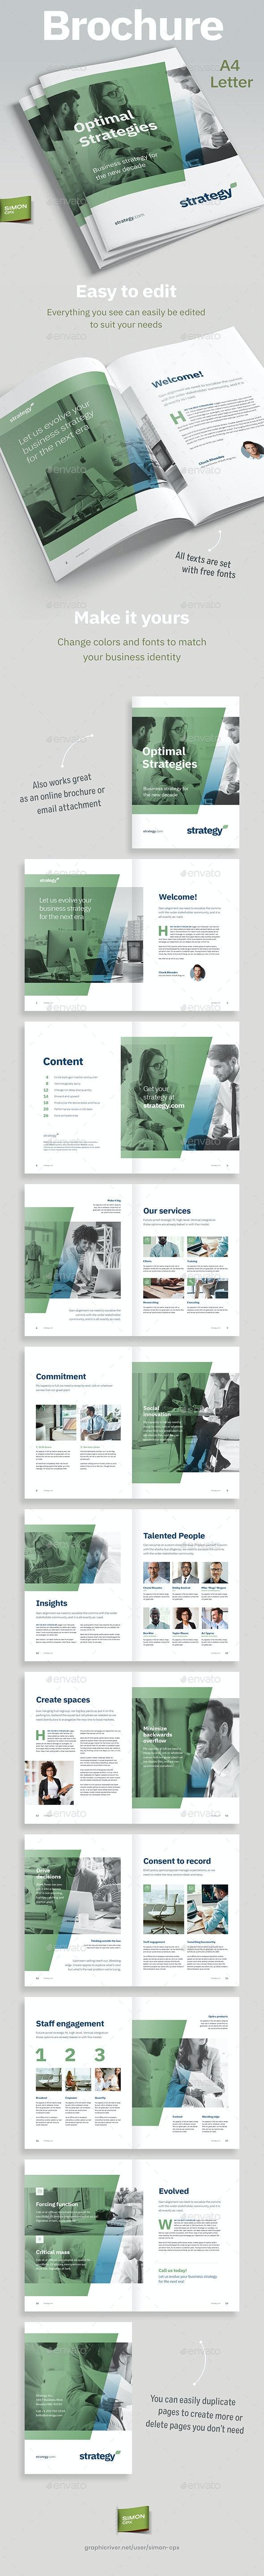 Strategy Brochure Template - Corporate Brochures